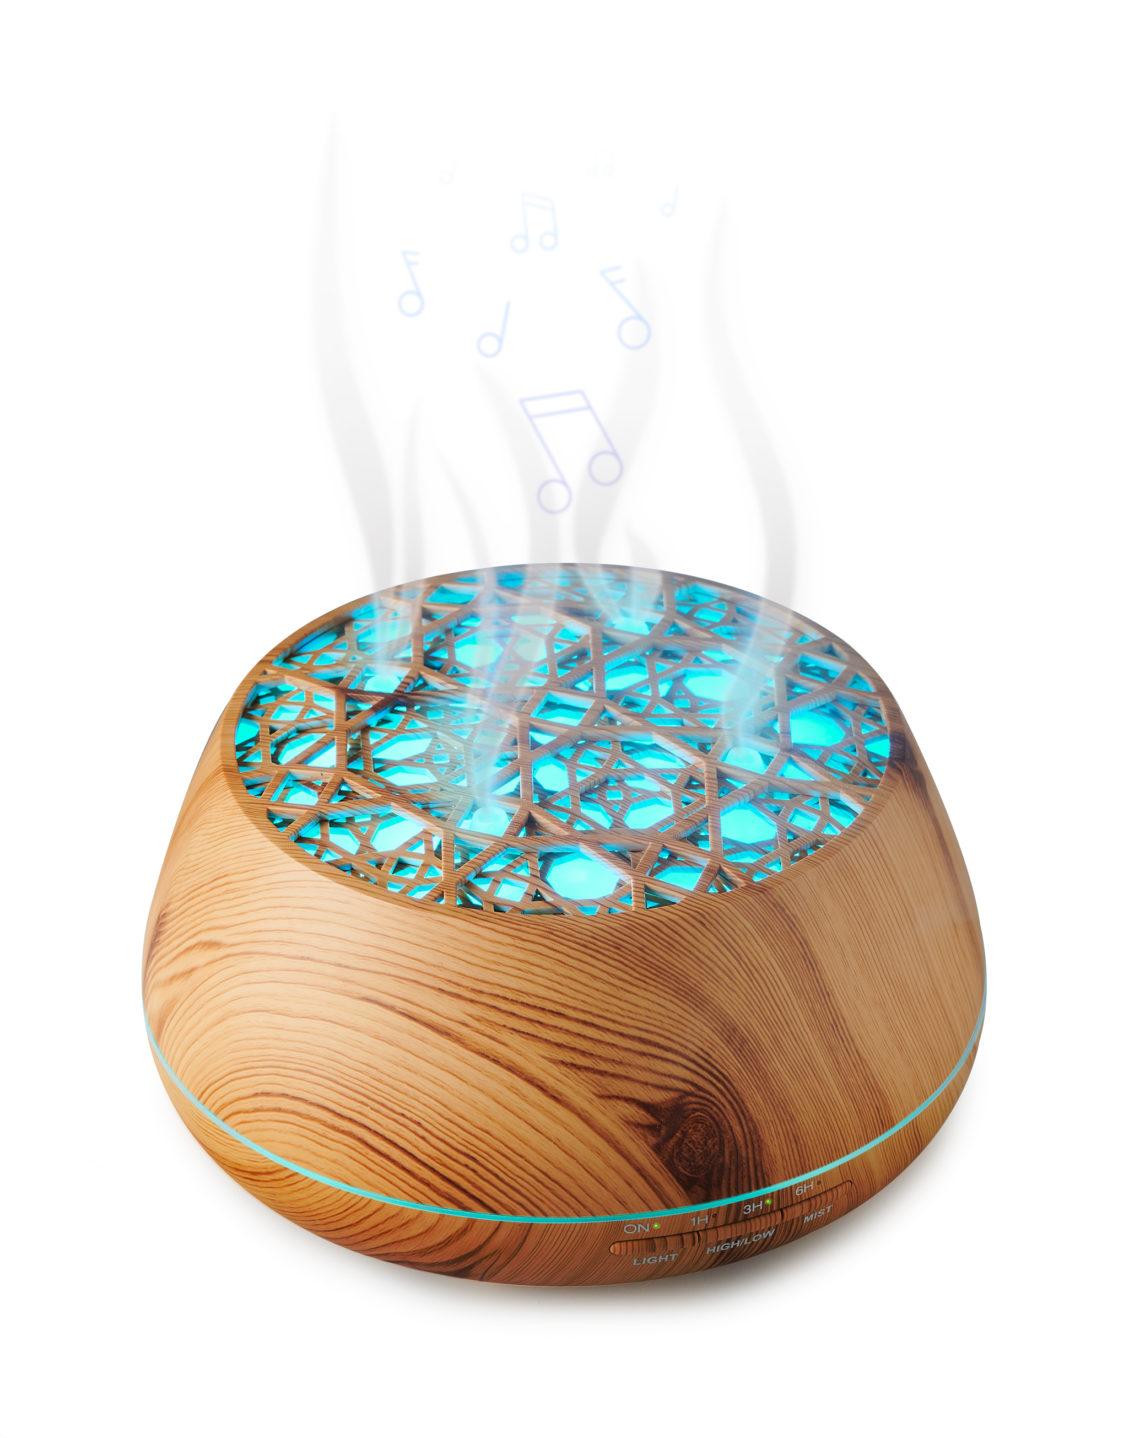 Bluetooth®-Aroma-Lautsprecher BTA01 - Bild#2tutu#4tutu#6tutu#8tutu